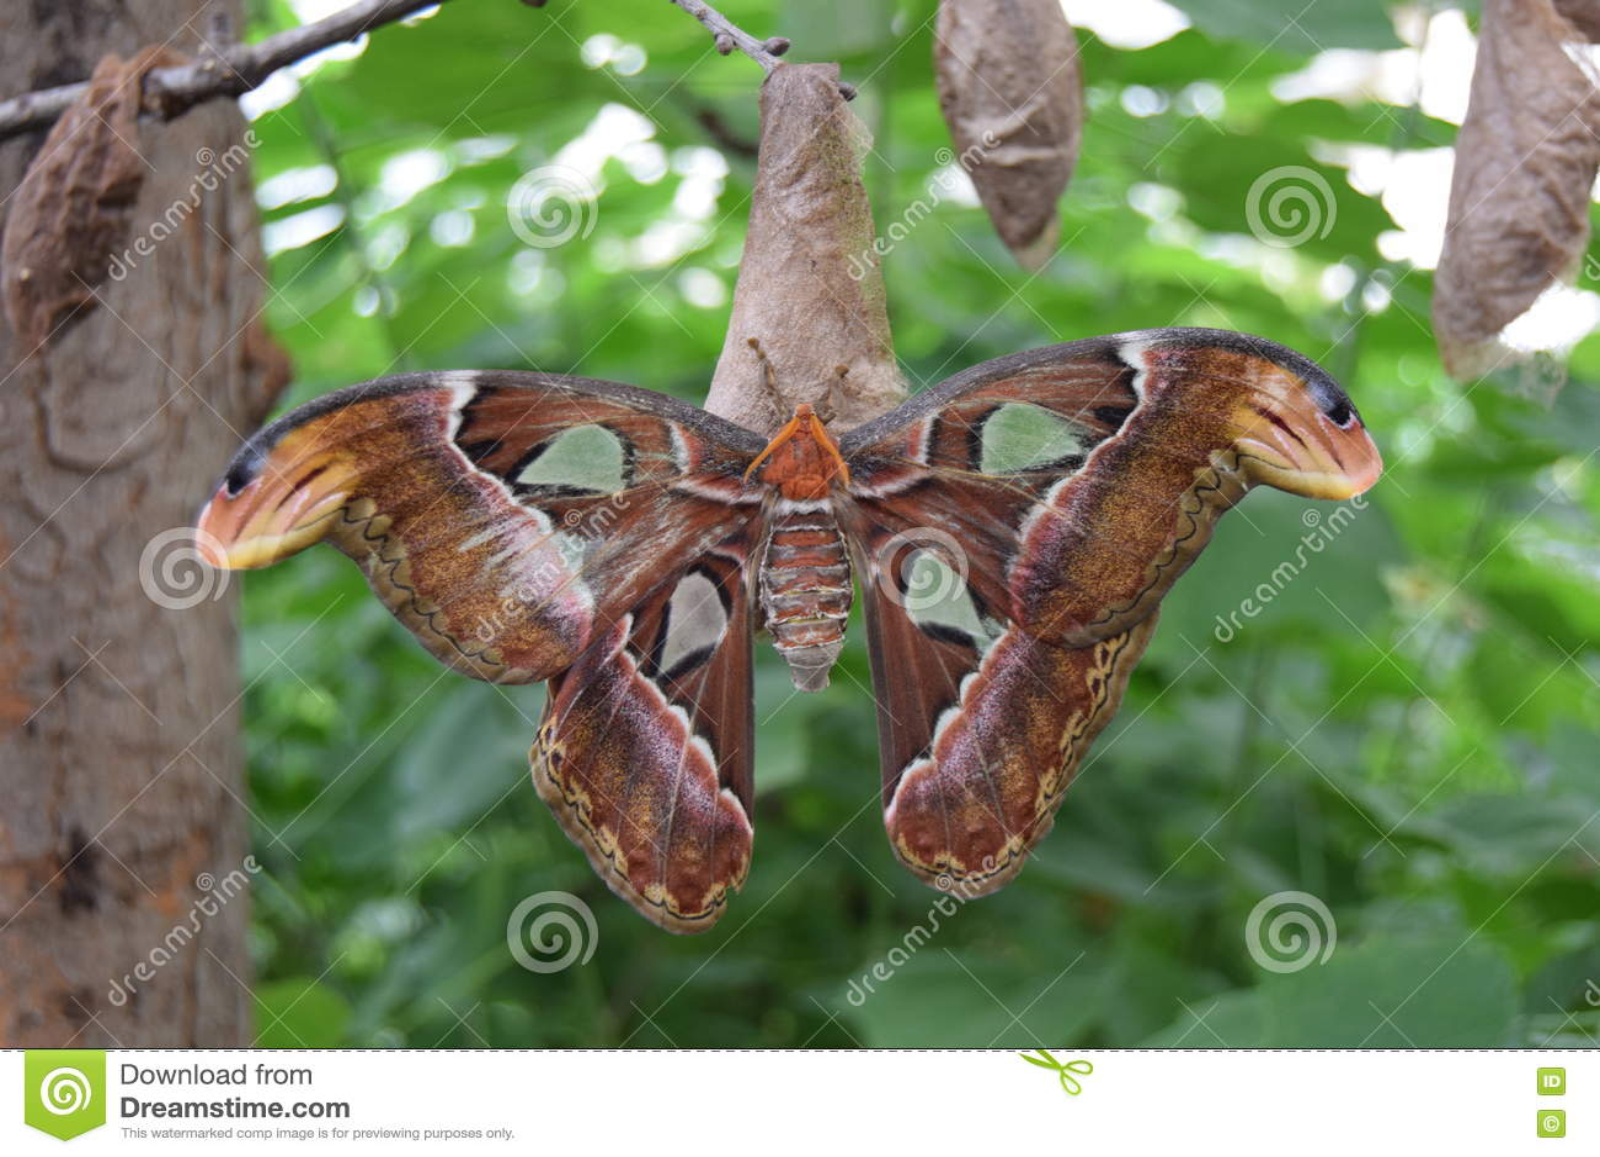 Motyl, atlanta ćma, insekt